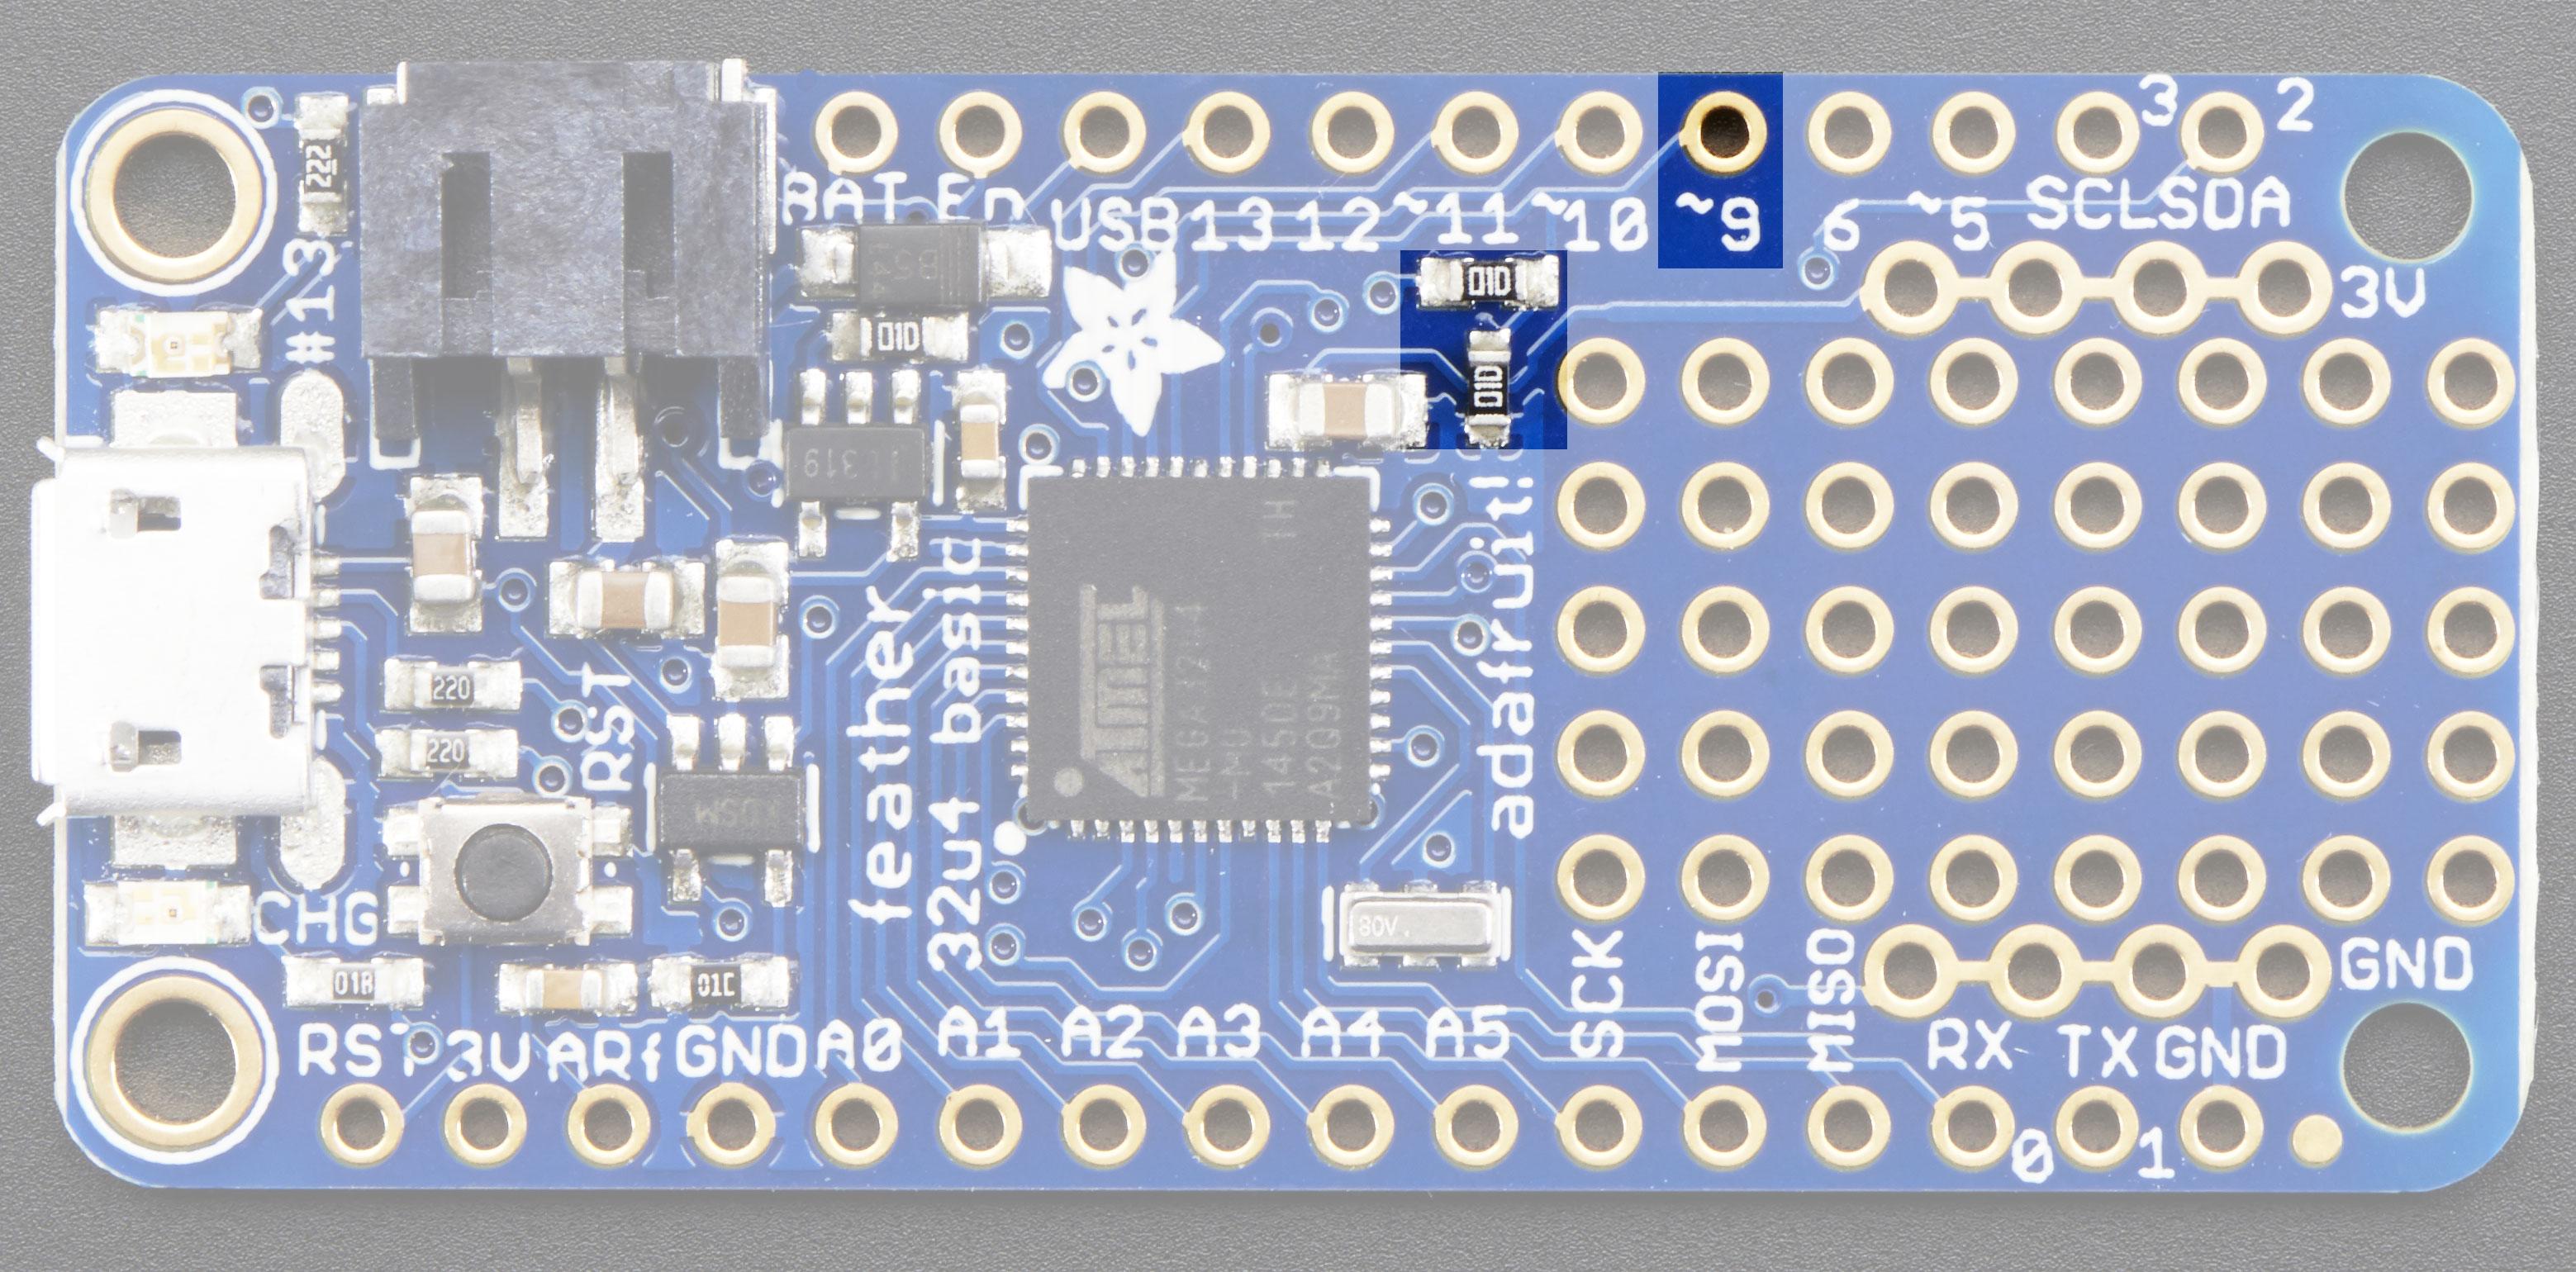 microcomputers_vbatmeasu.jpg